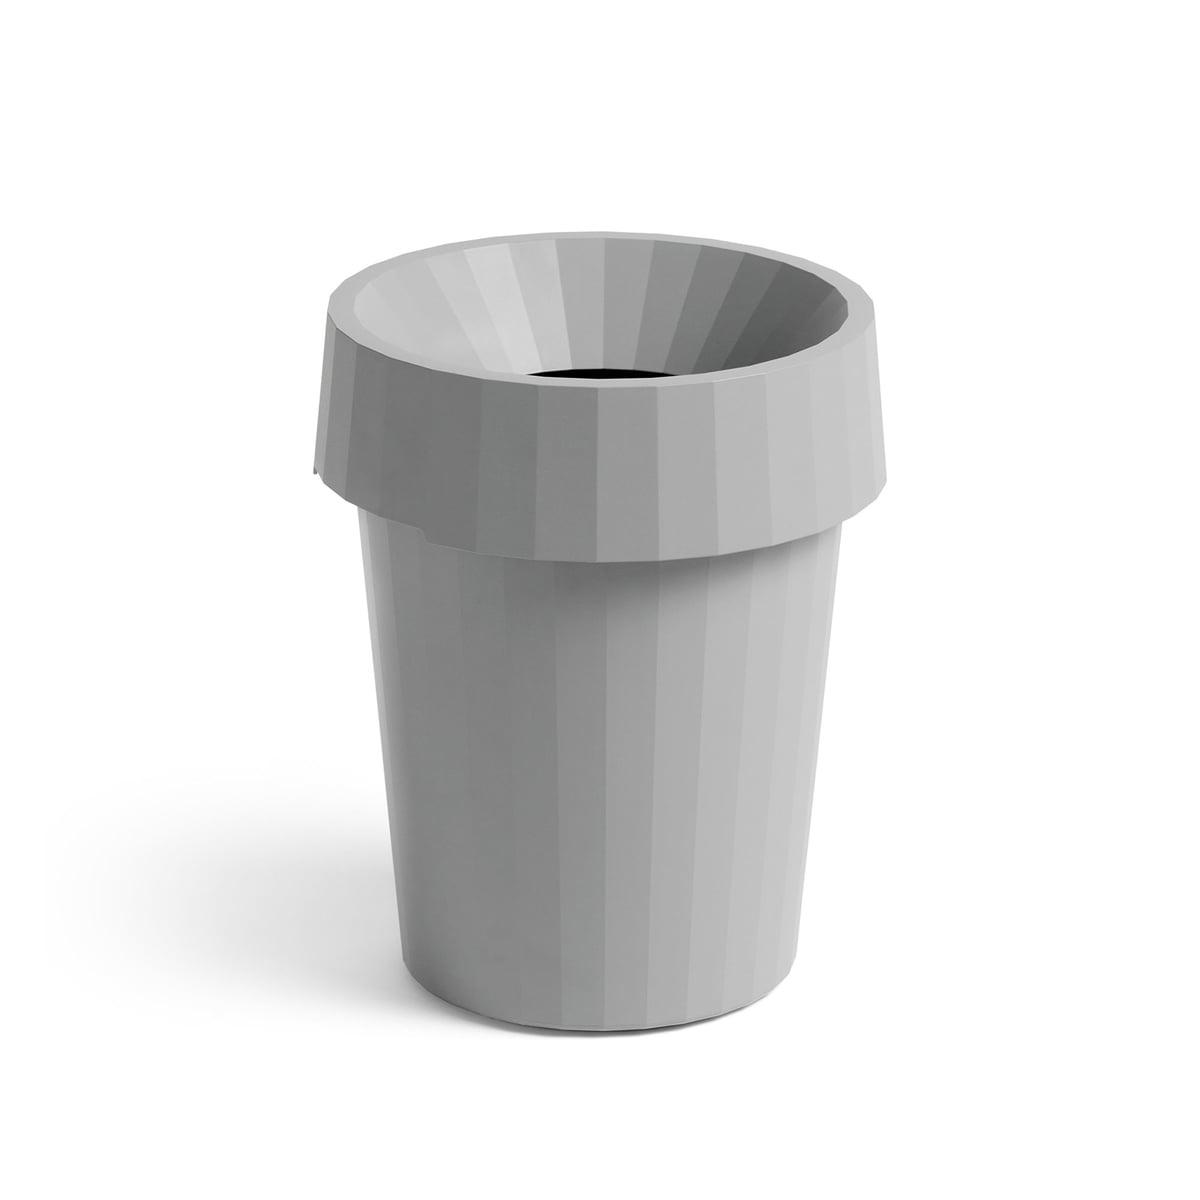 Designer Papierkorb Mülleimer Metall-Rahmen Büro Mülleimer VERSANDKOSTEN FREI